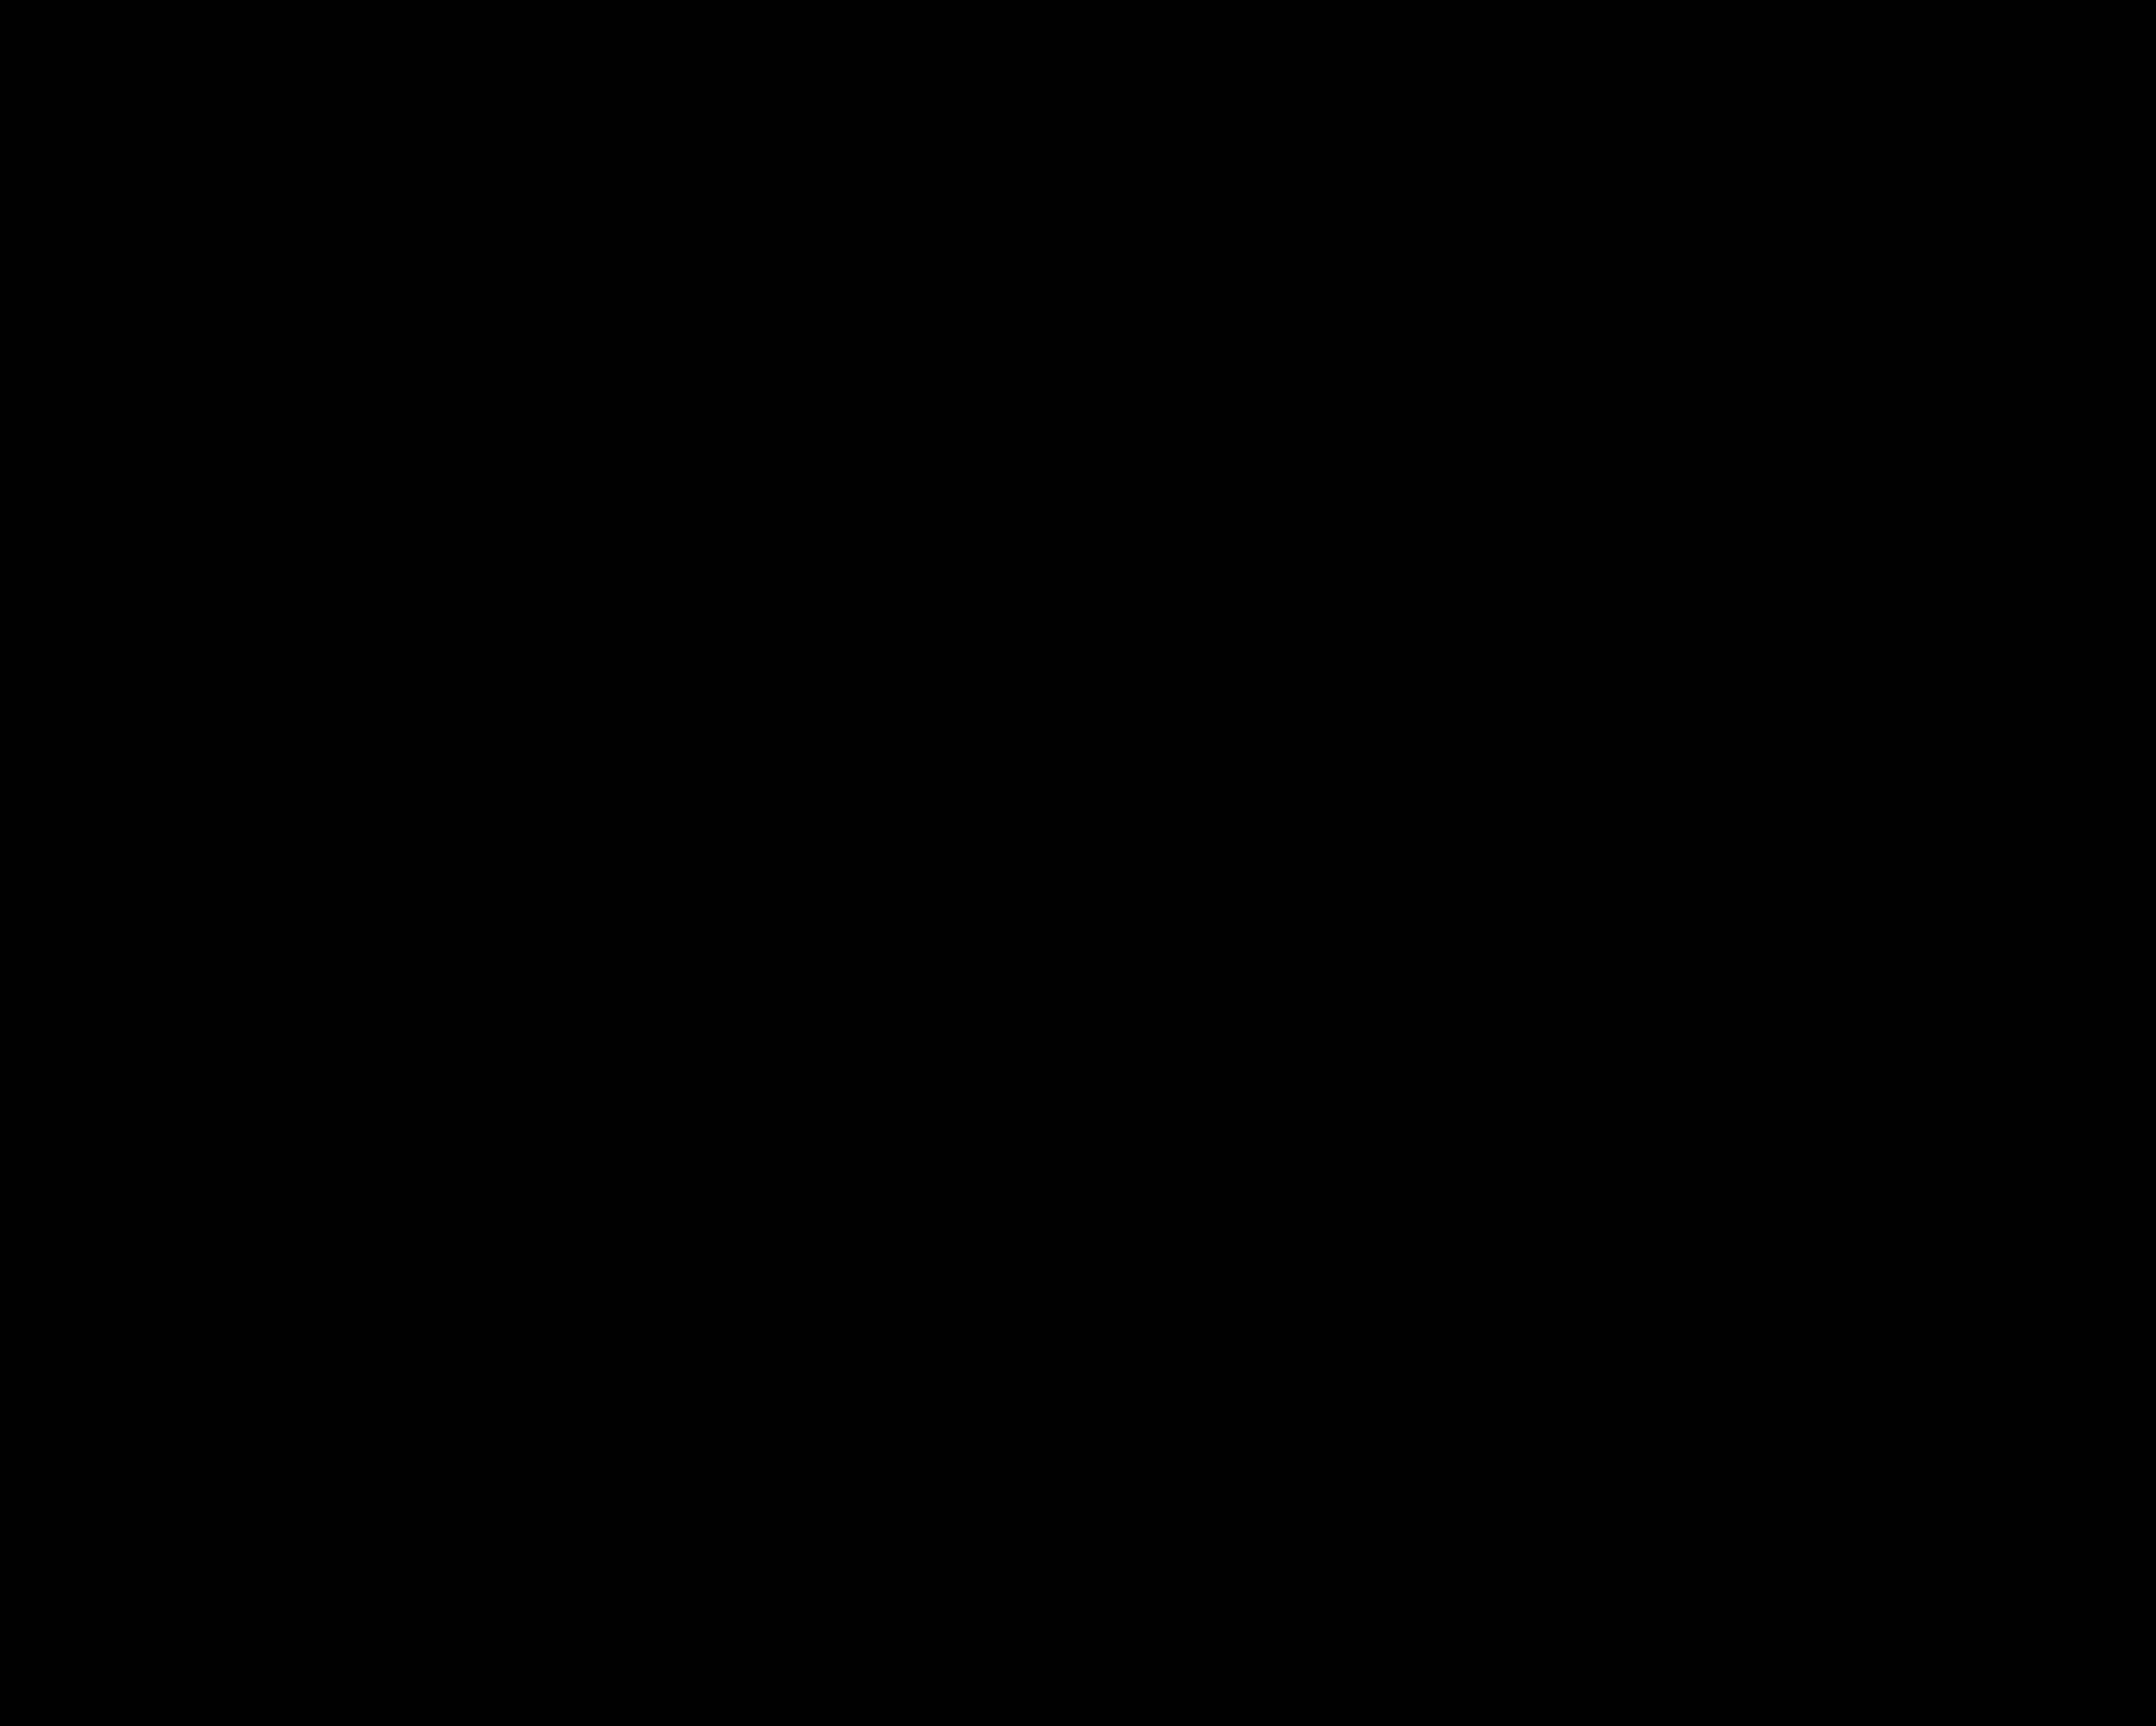 _2BP0423_A